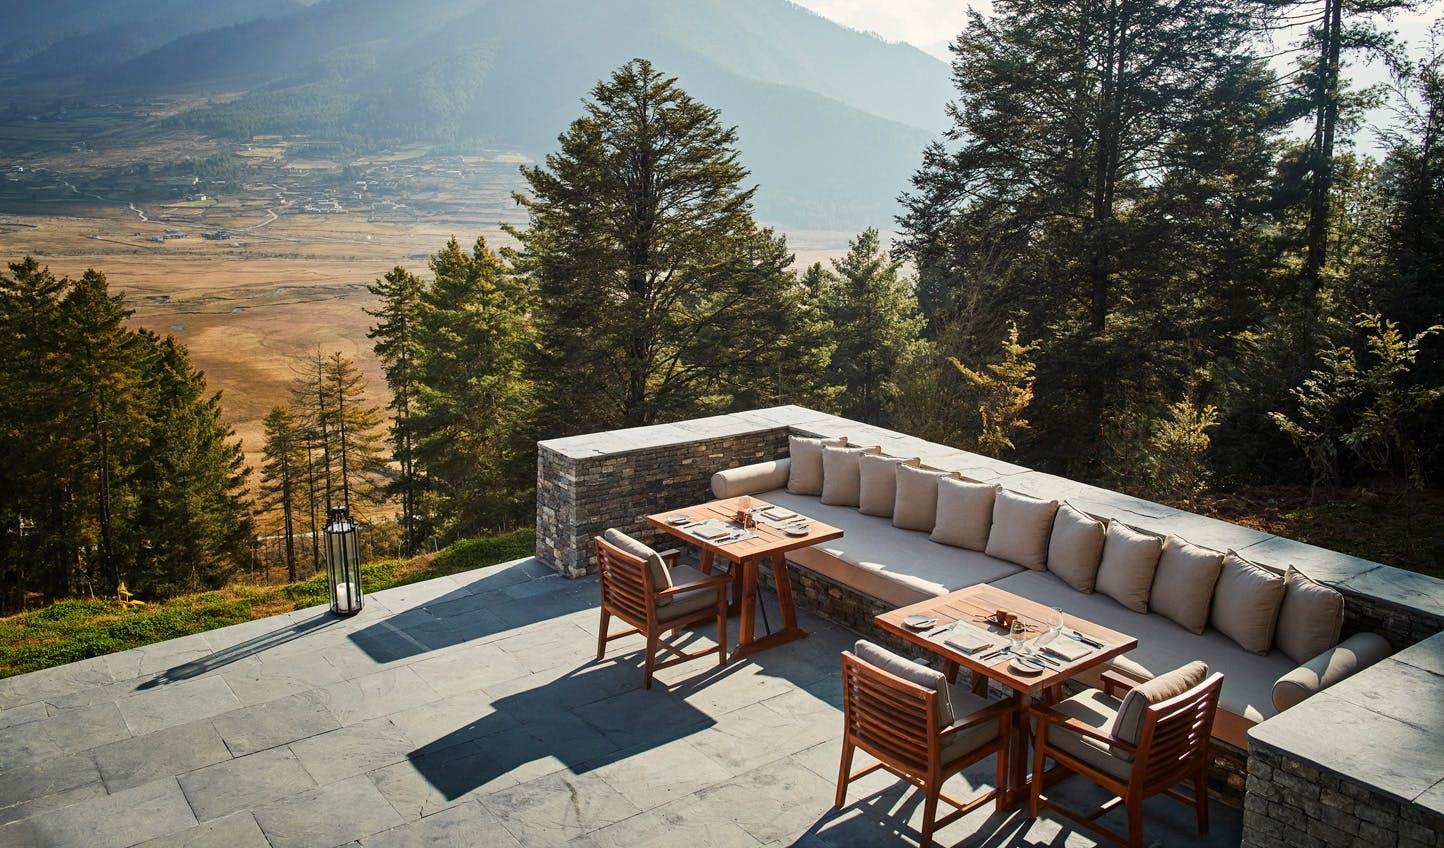 Six Senses Bhutan Gangtey | Luxury Hotels & Lodges in Bhutan